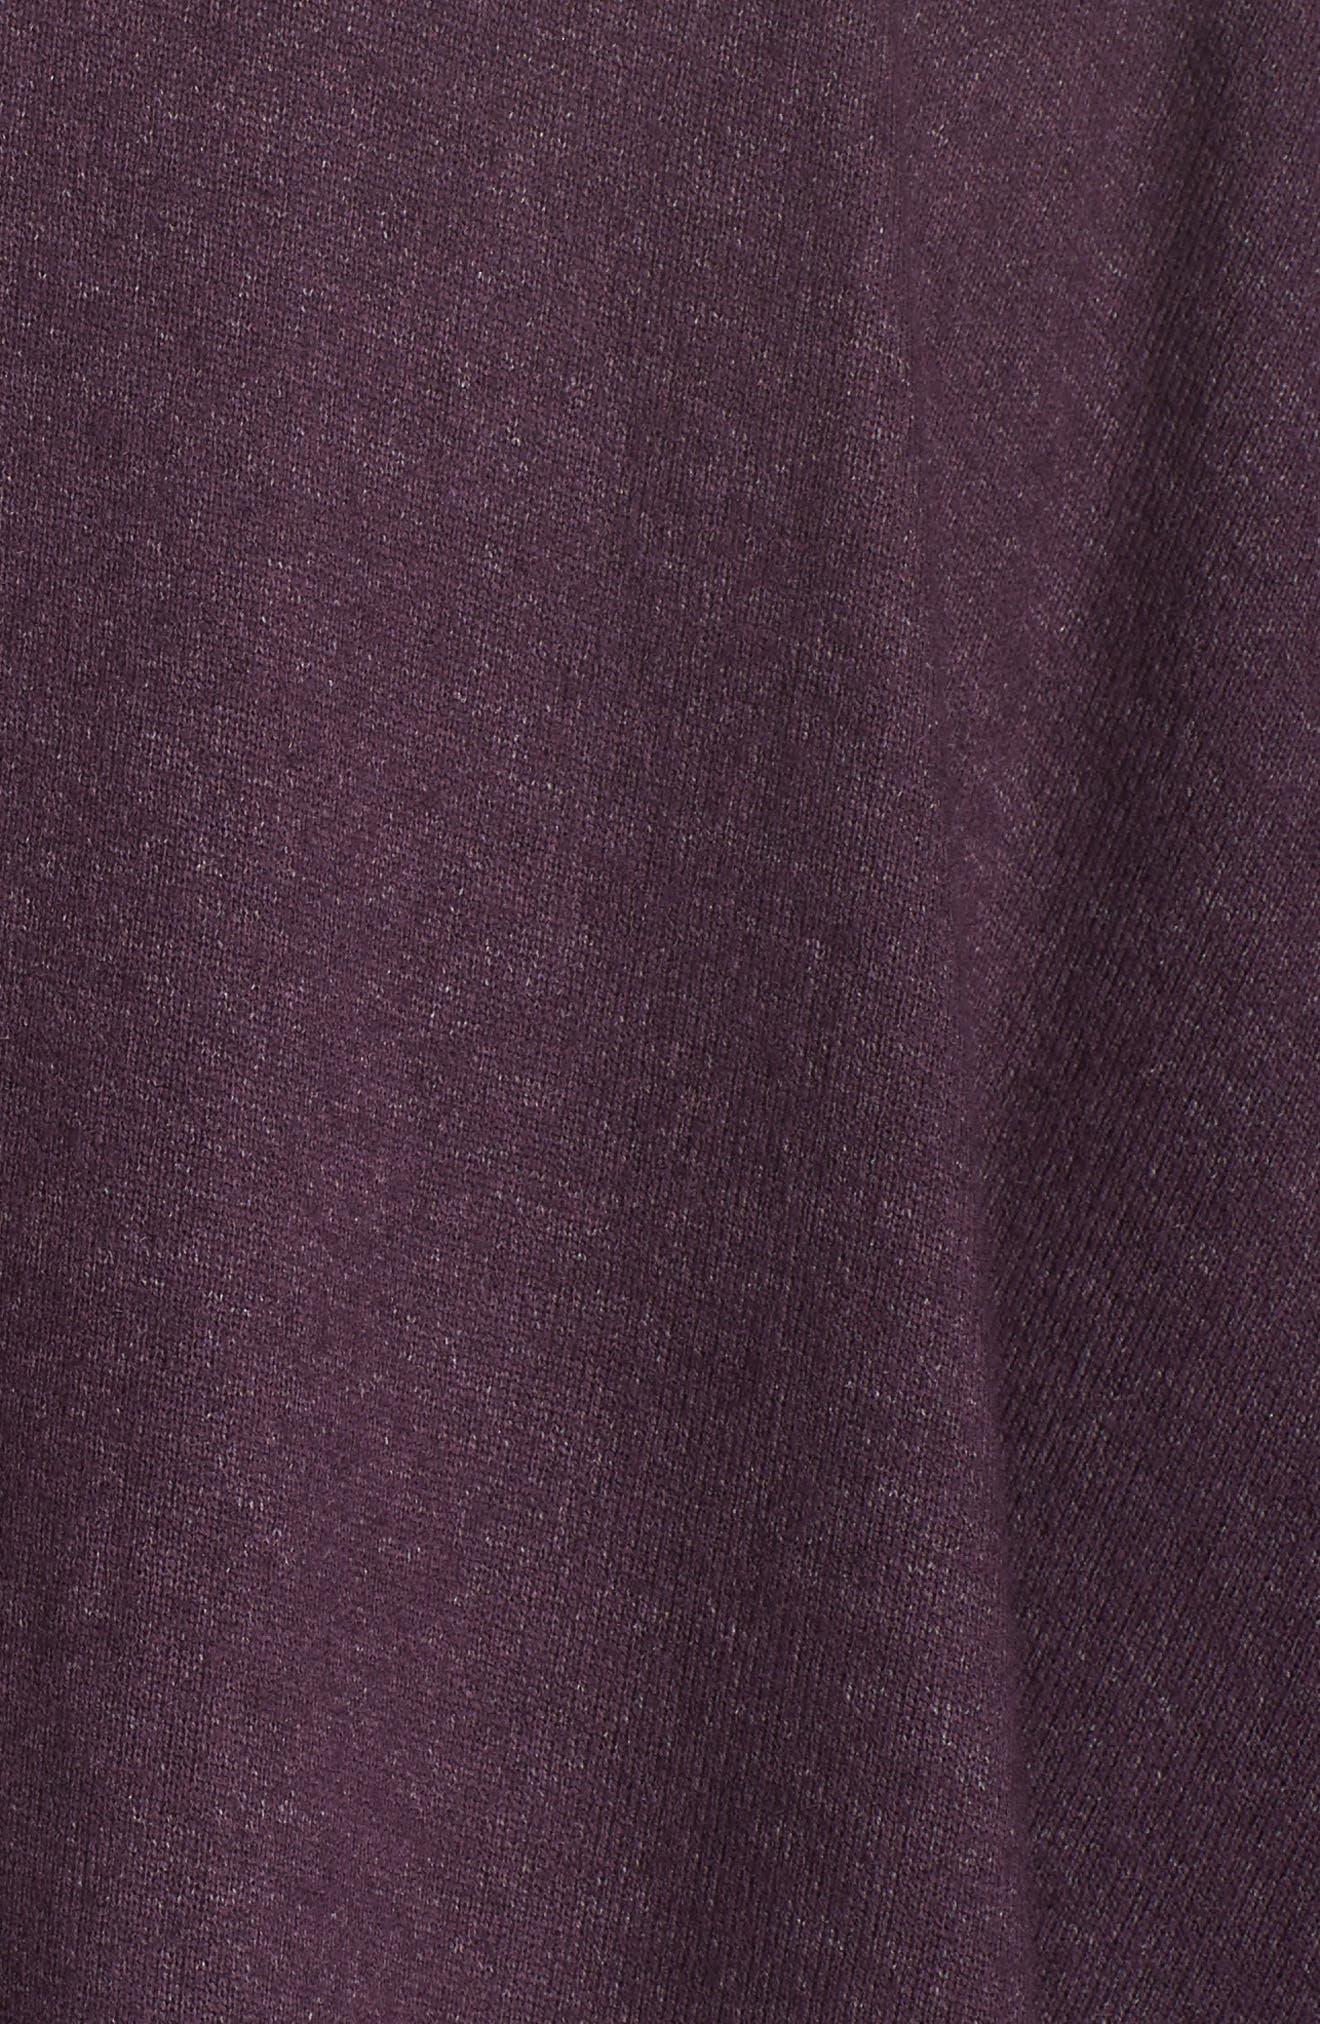 Retreat Sweater Knit Cardigan,                             Alternate thumbnail 6, color,                             Aubergine